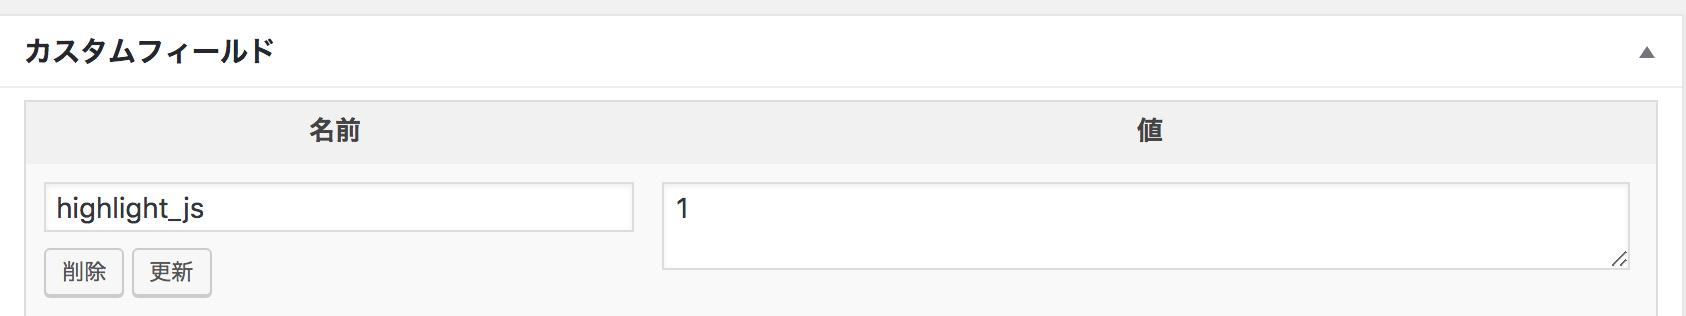 WordPress「カスタムフィールド」の名前と値を設定